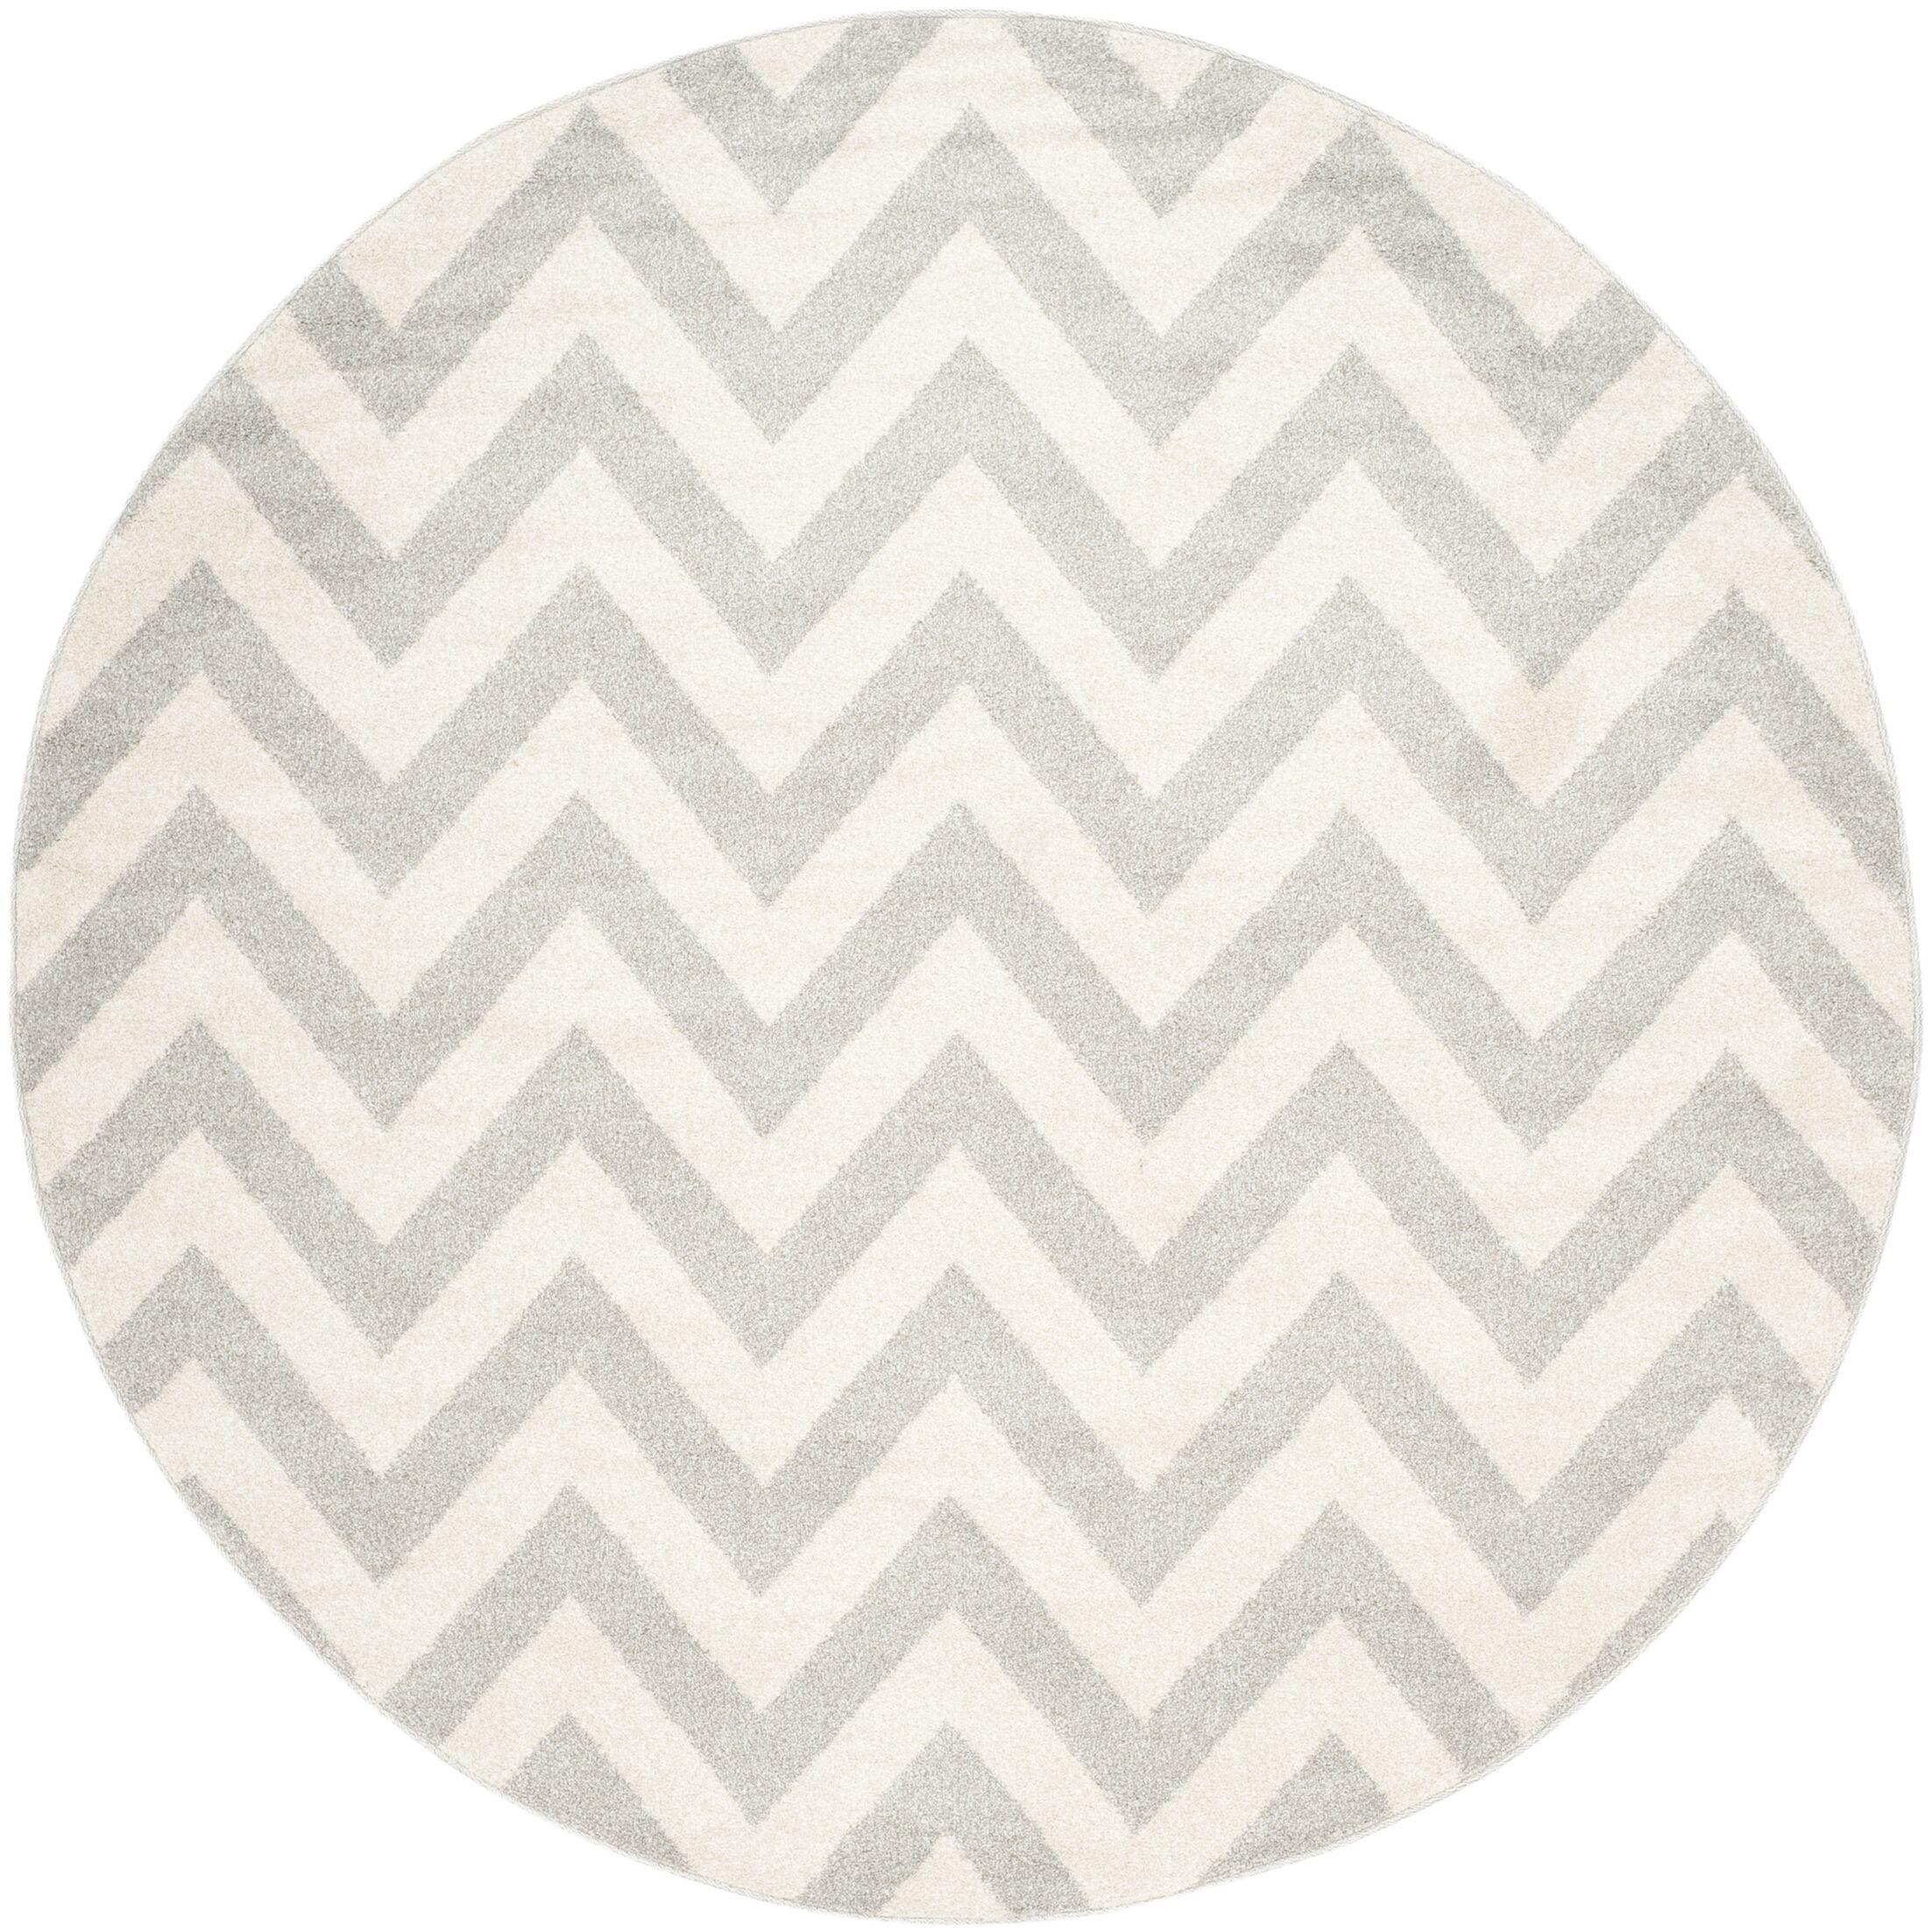 Currey Light Grey/Beige Area Rug Rug Size: Rectangle 9' x 12'